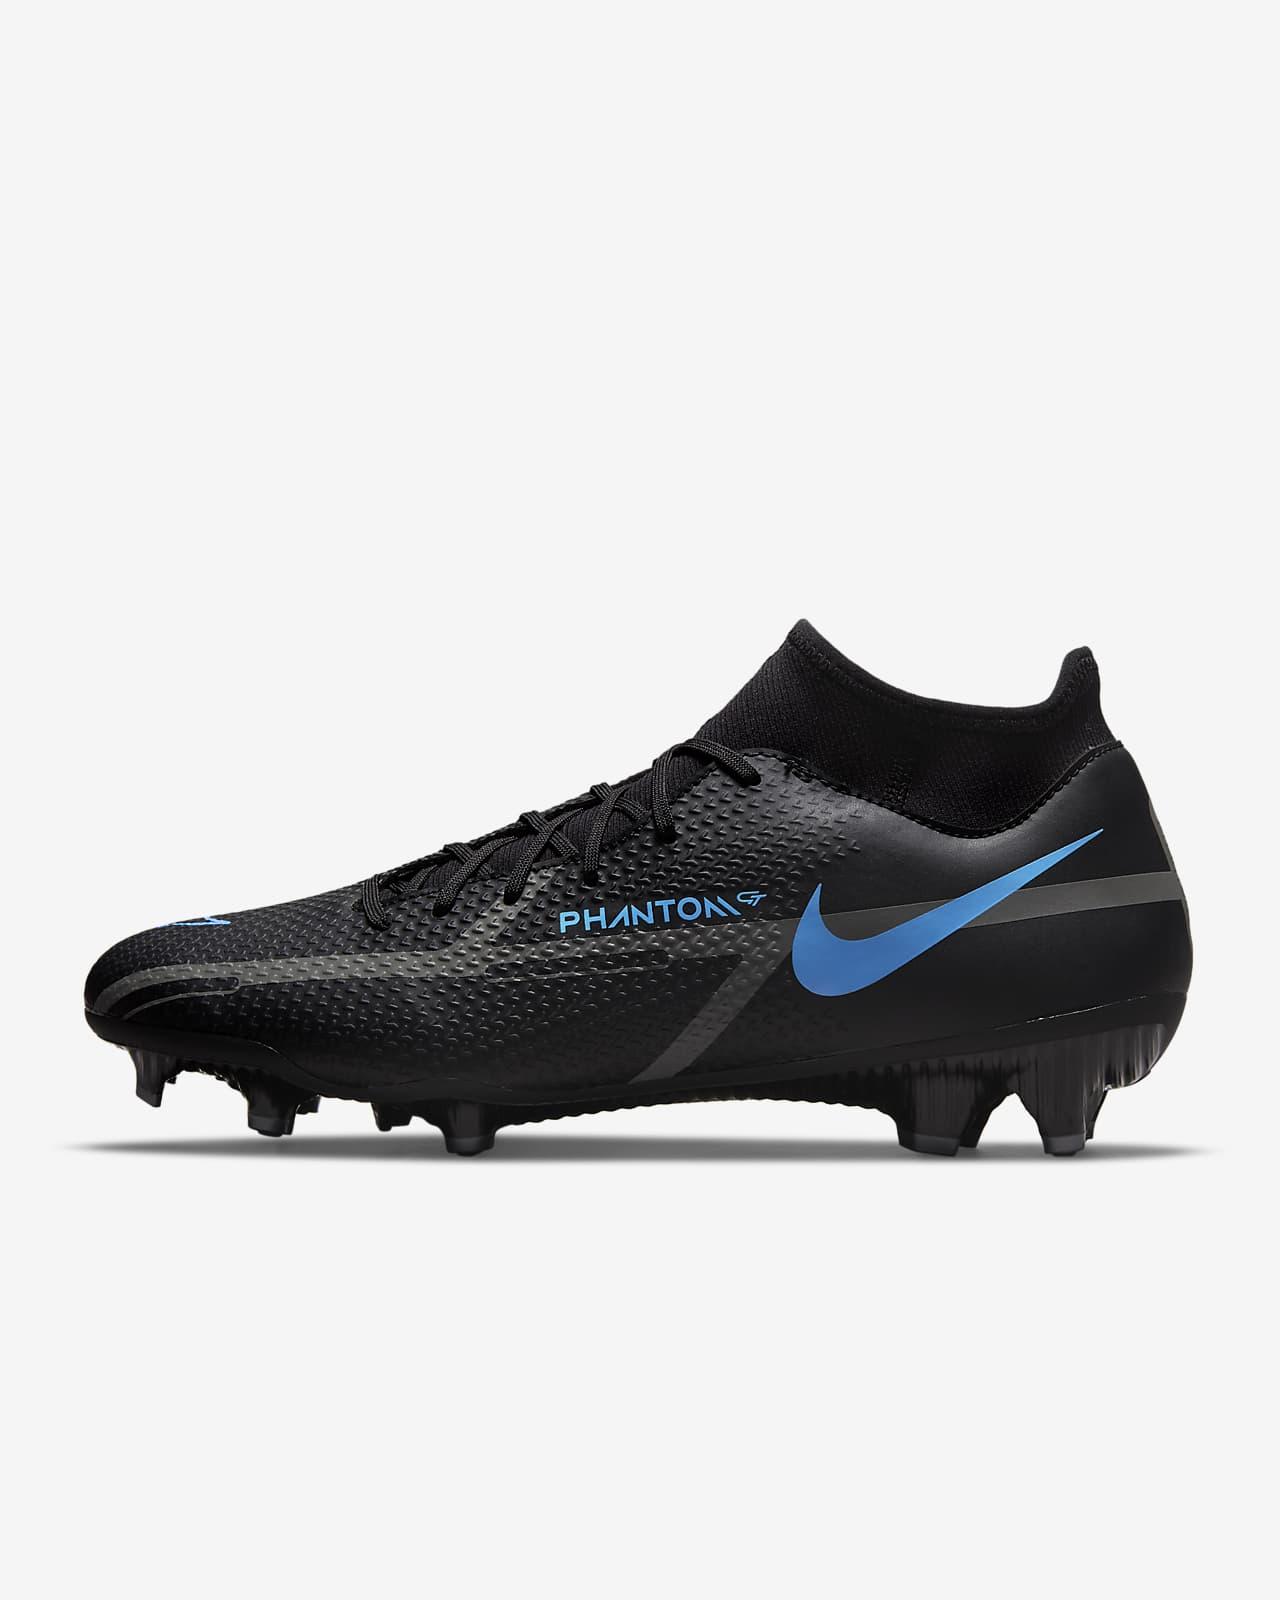 Calzado de fútbol para terrenos múltiples Nike Phantom GT2 Academy Dynamic Fit MG